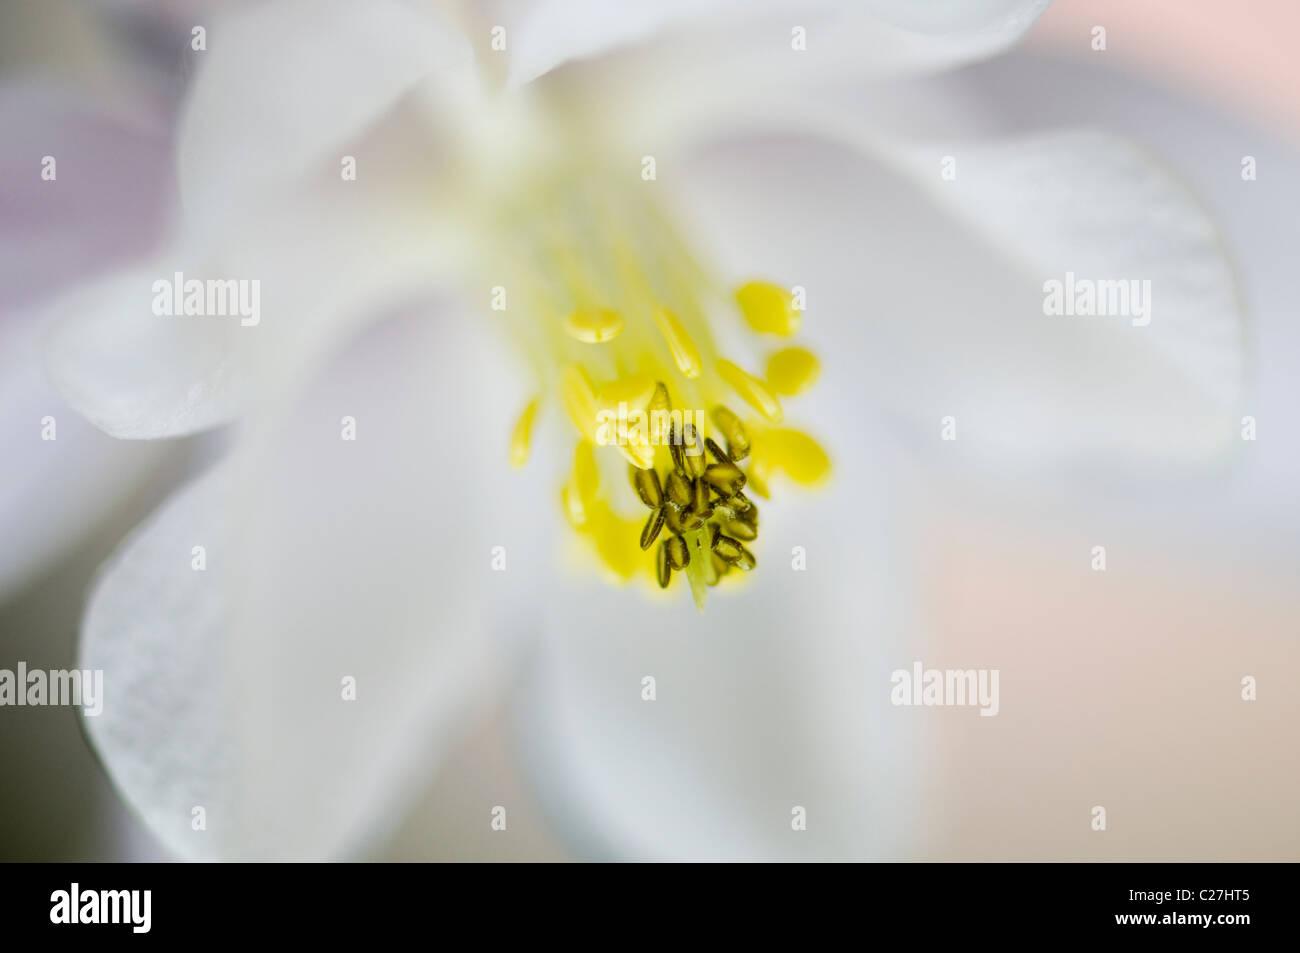 Einzelne weiße Aquilegia Vulgaris Blume - Akelei Stockbild